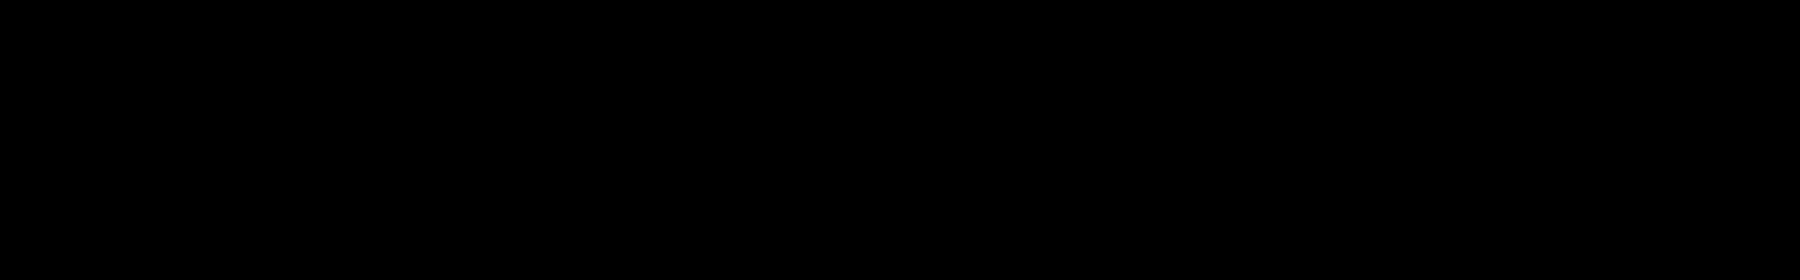 MIRRORS Ambient BGM Sample Pack audio waveform